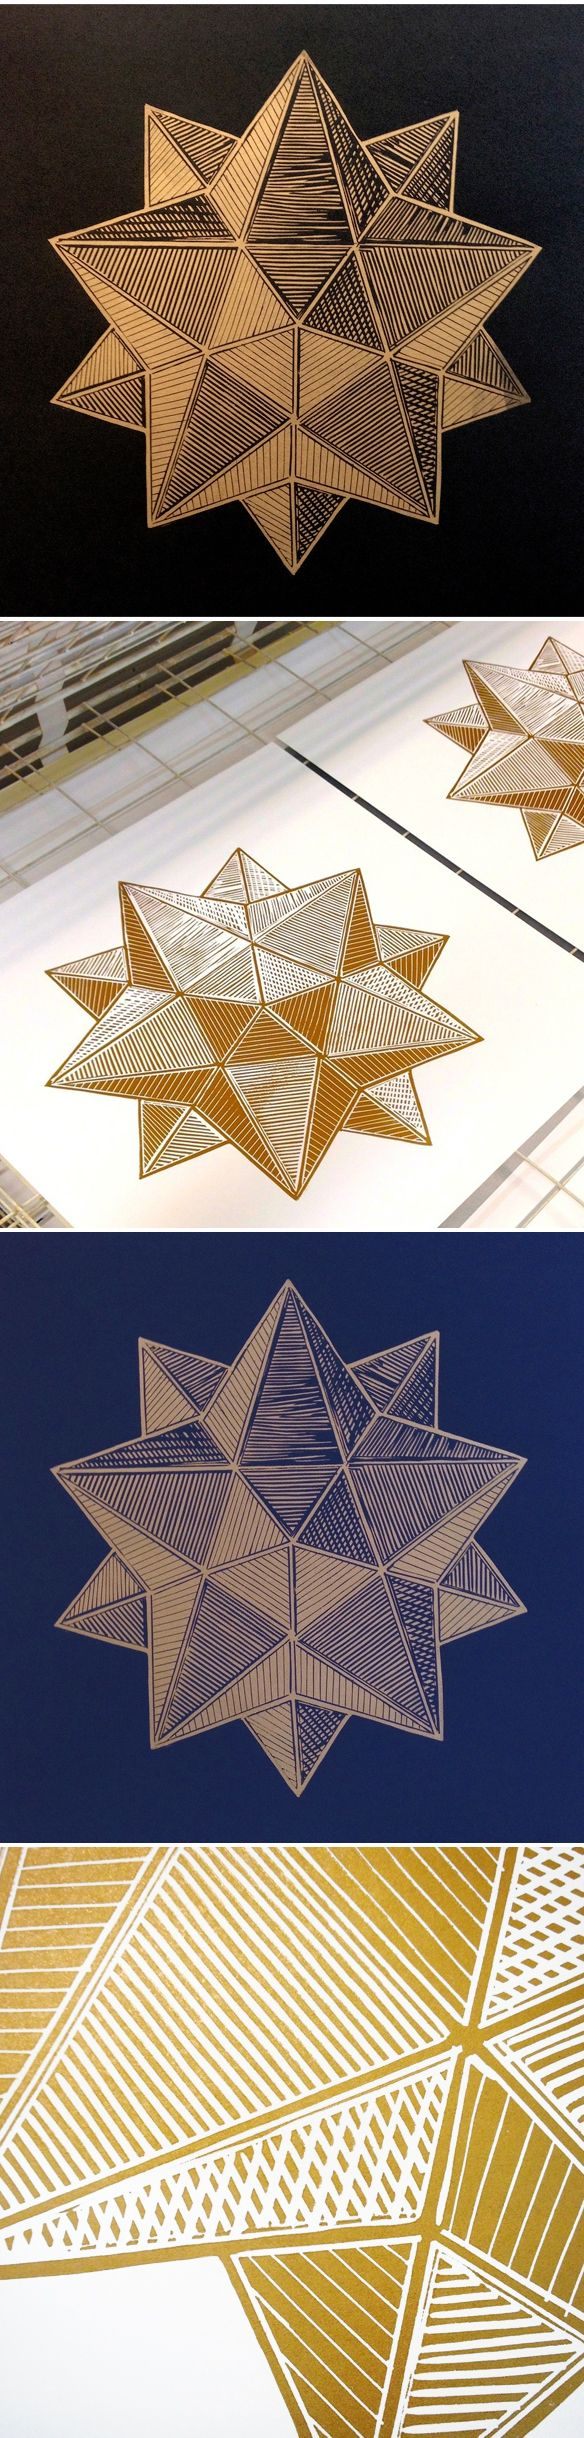 linocut prints by monika petersen (and metallic ink!)